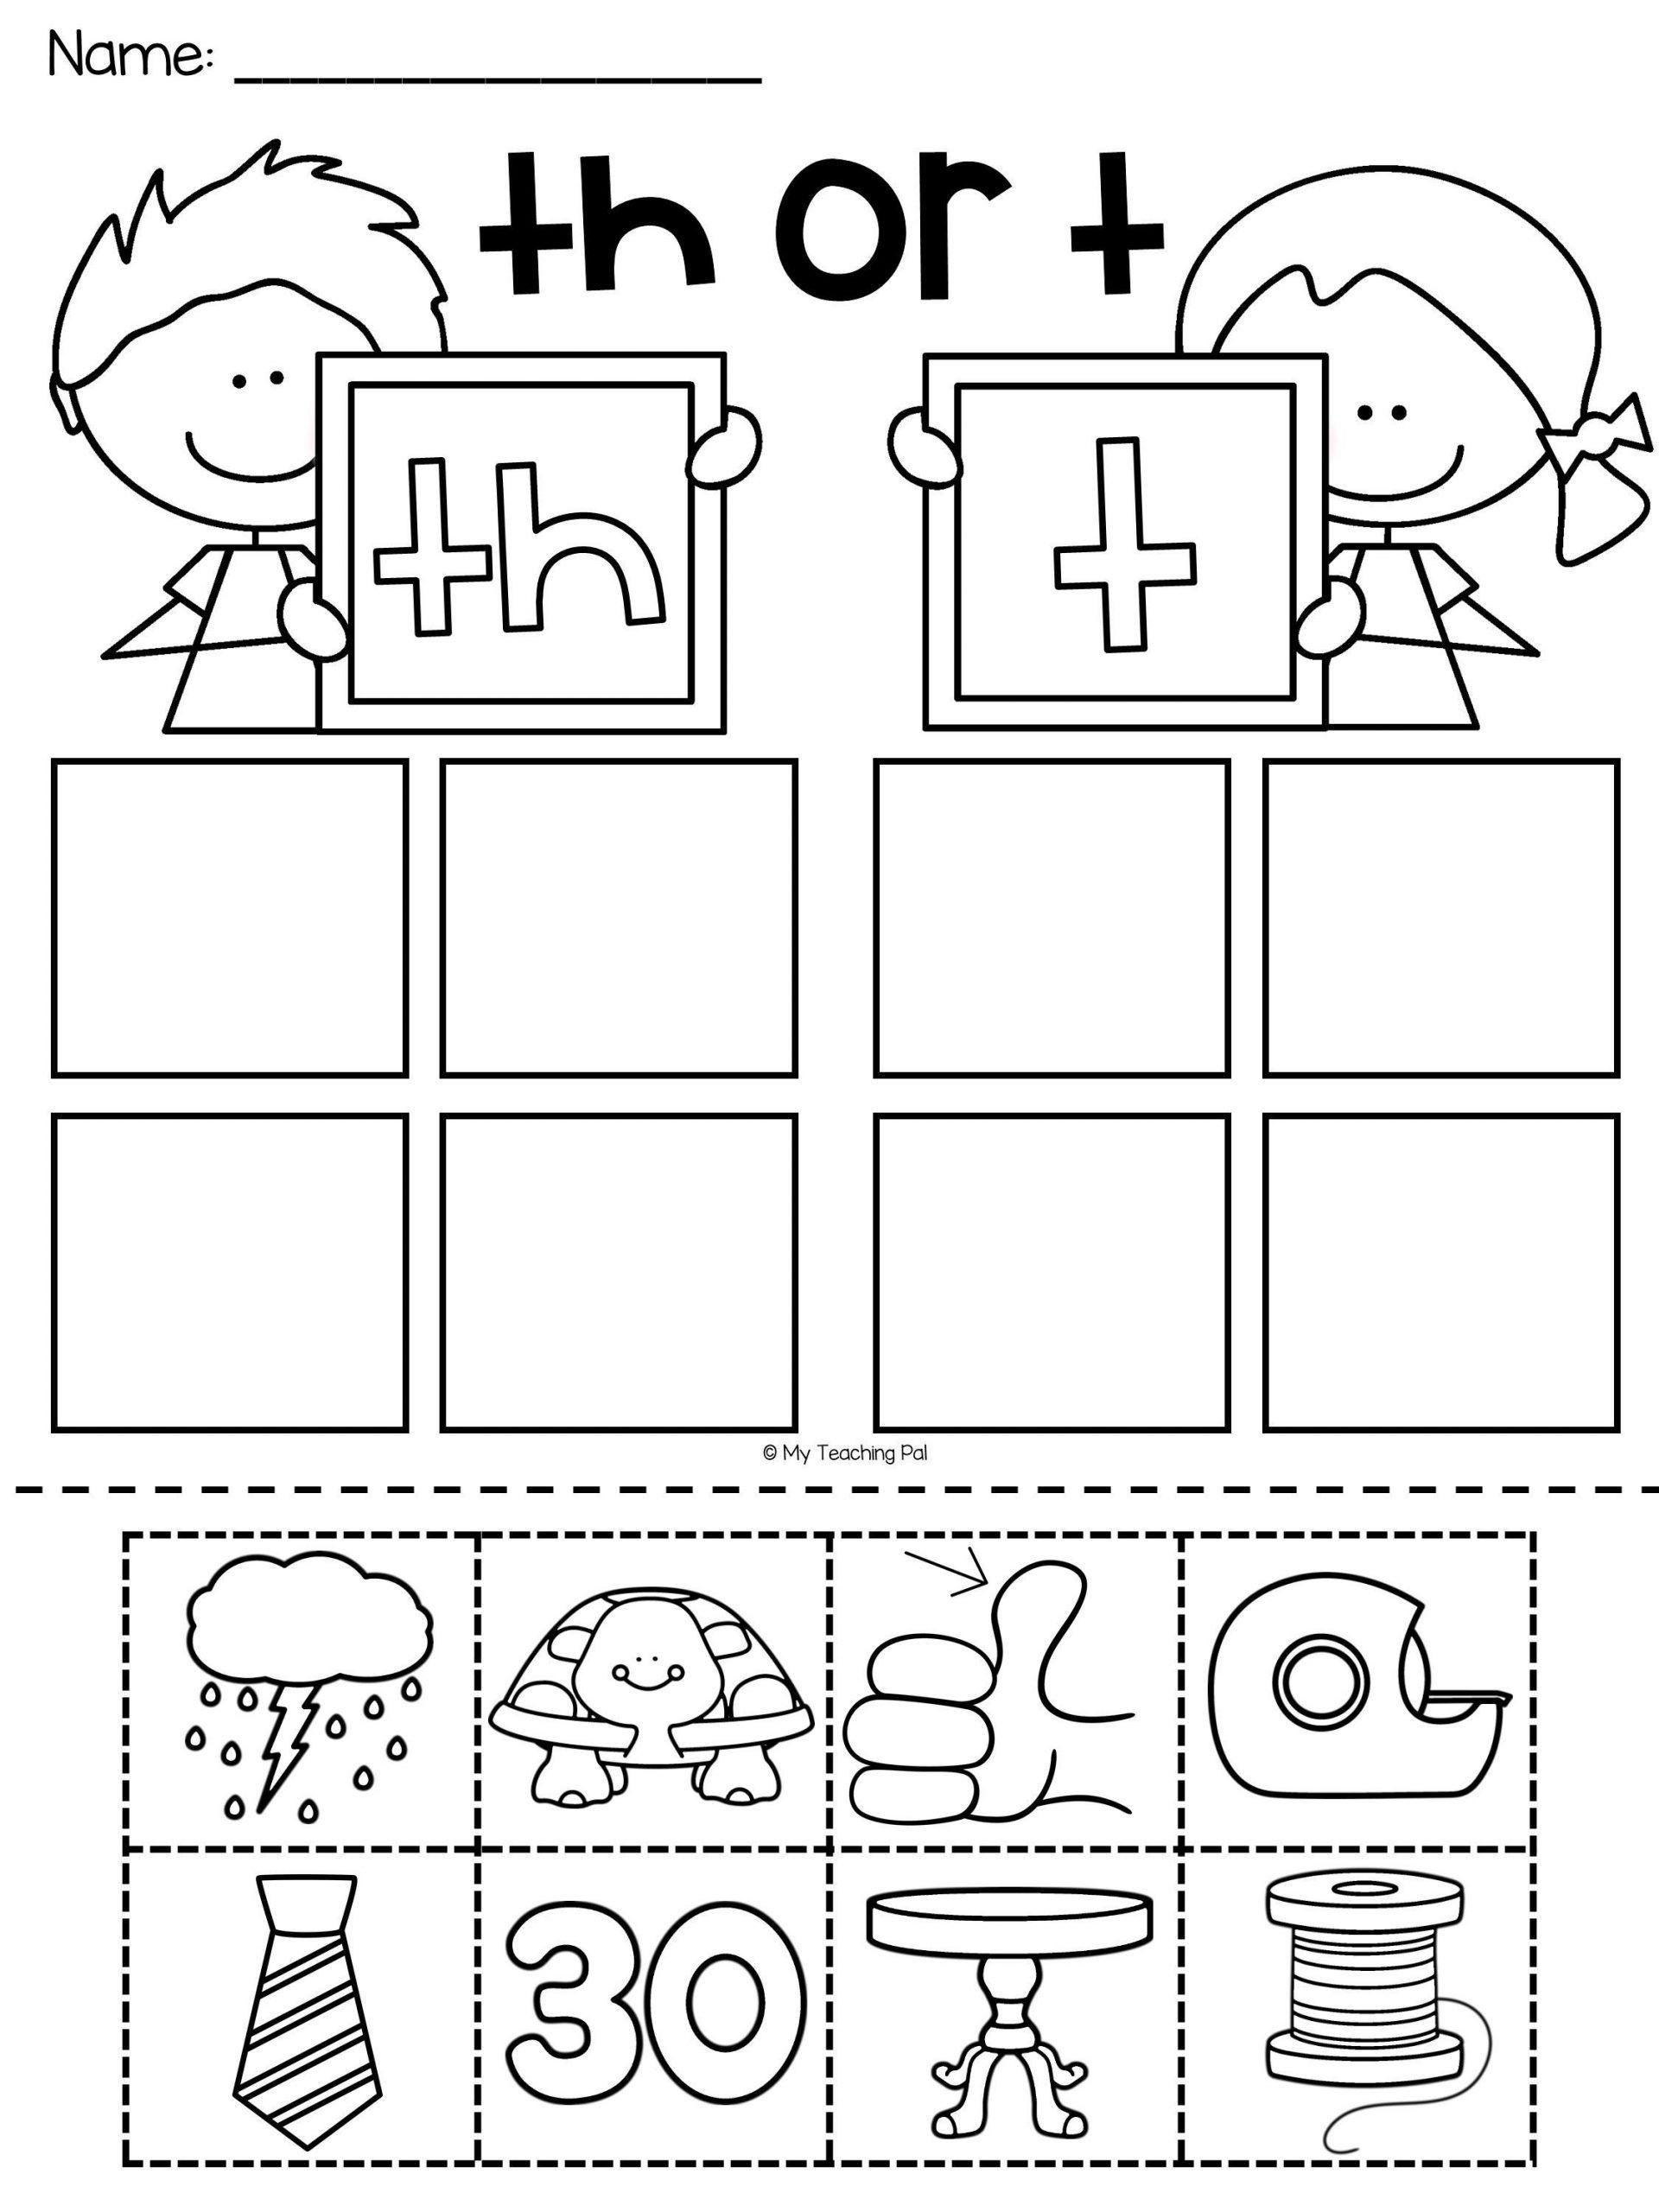 Digraph Worksheets For Kindergarten In